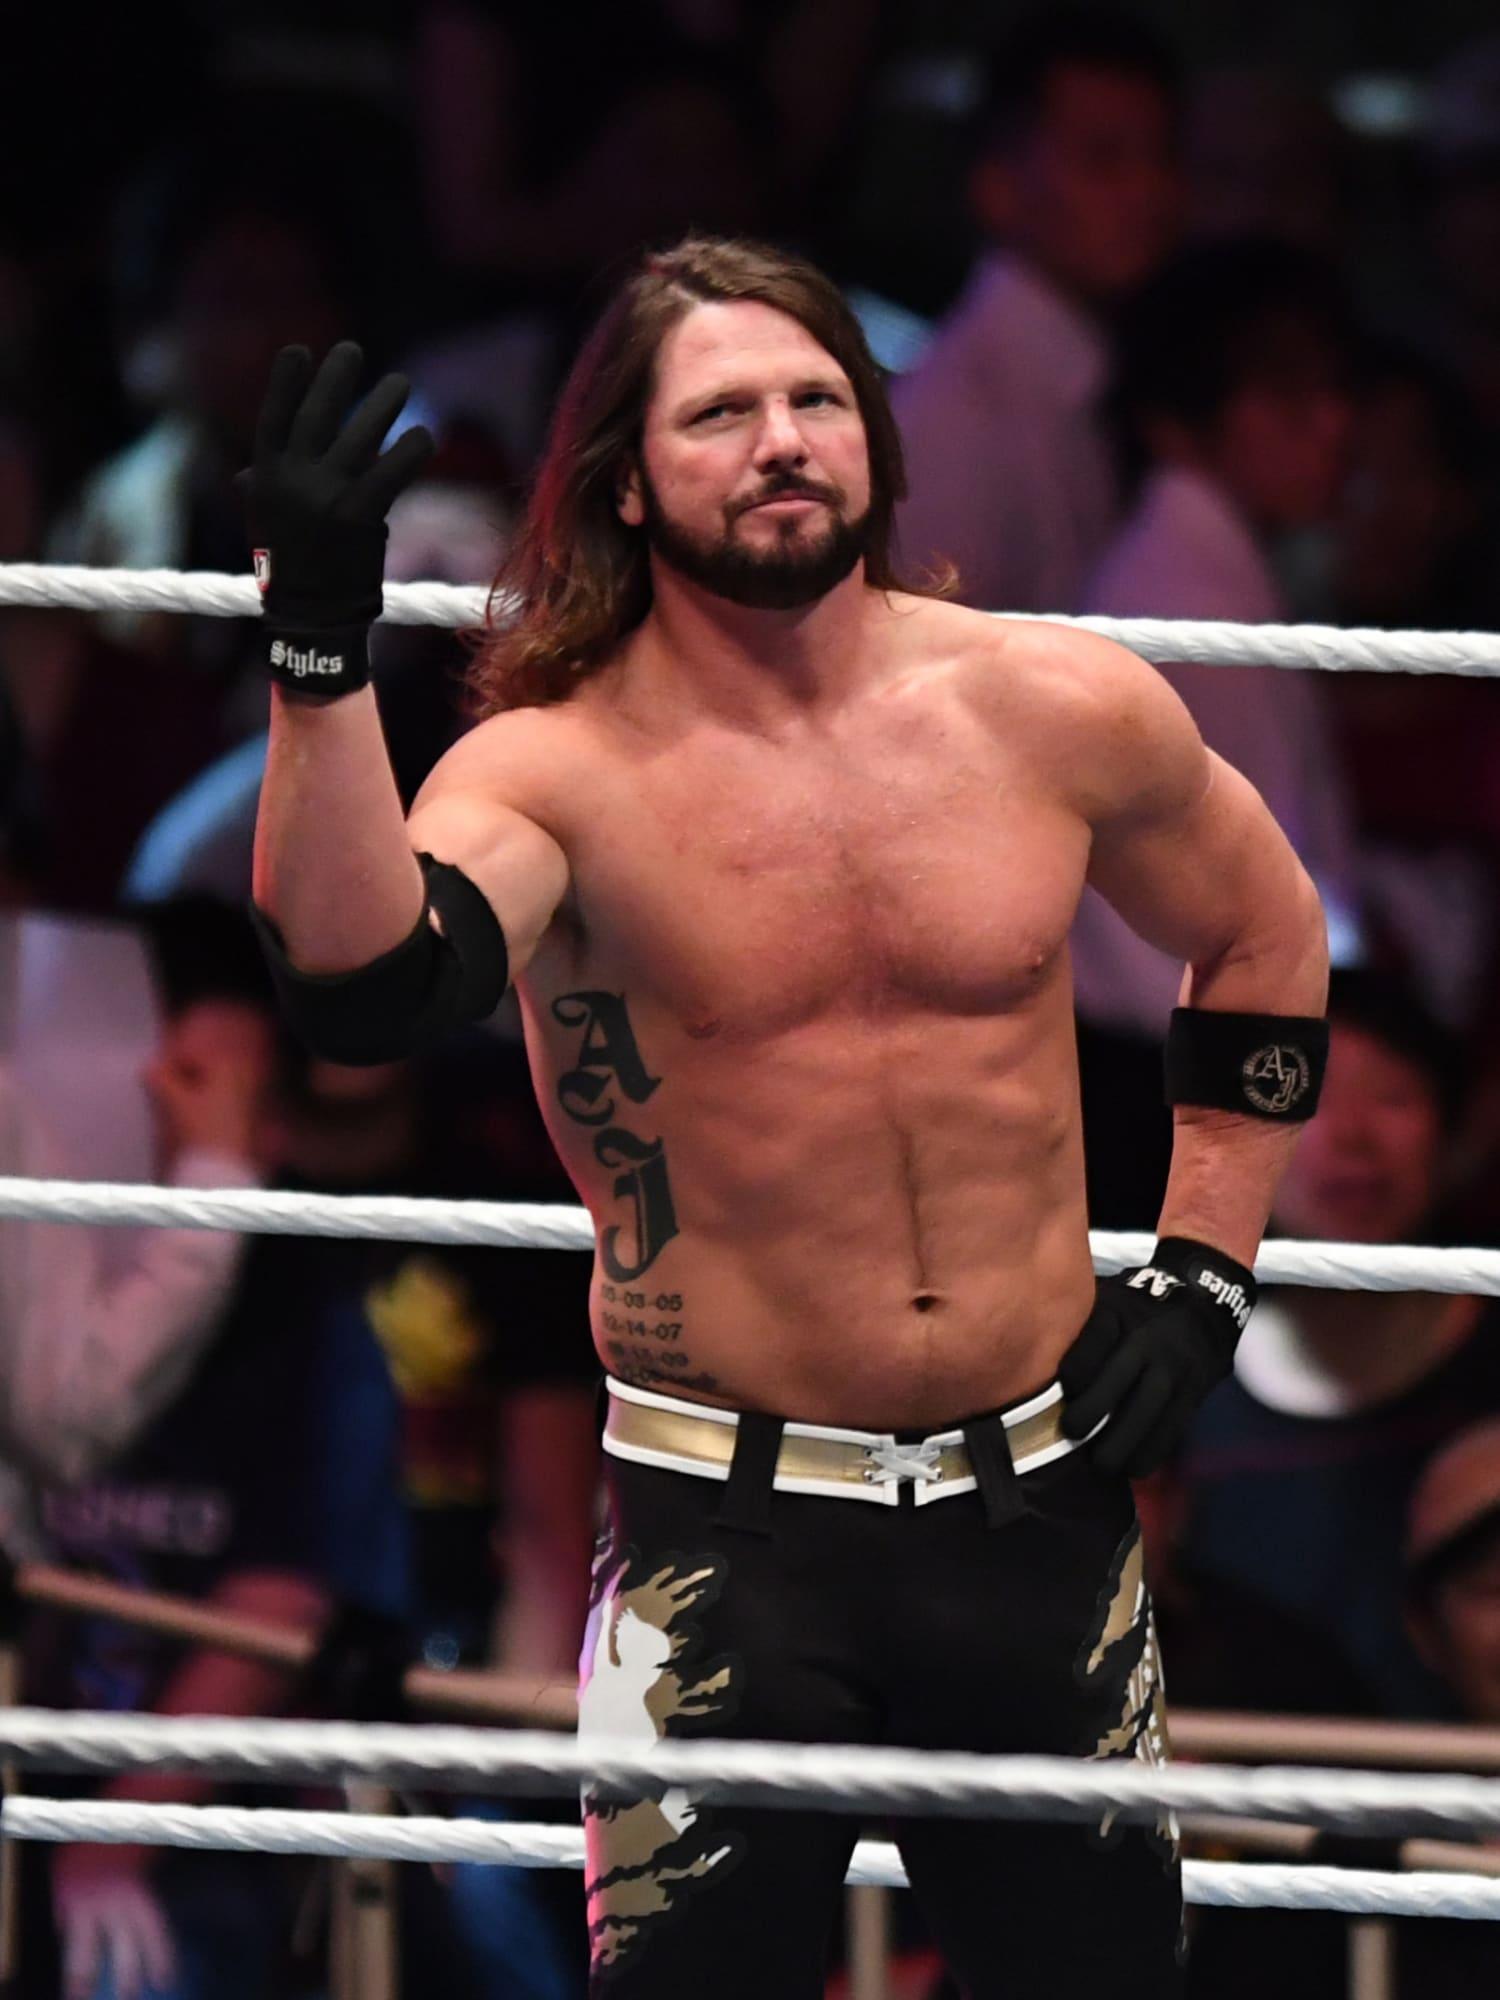 WWE Monday Night Raw: AJ Styles defeats Randy Orton in main event